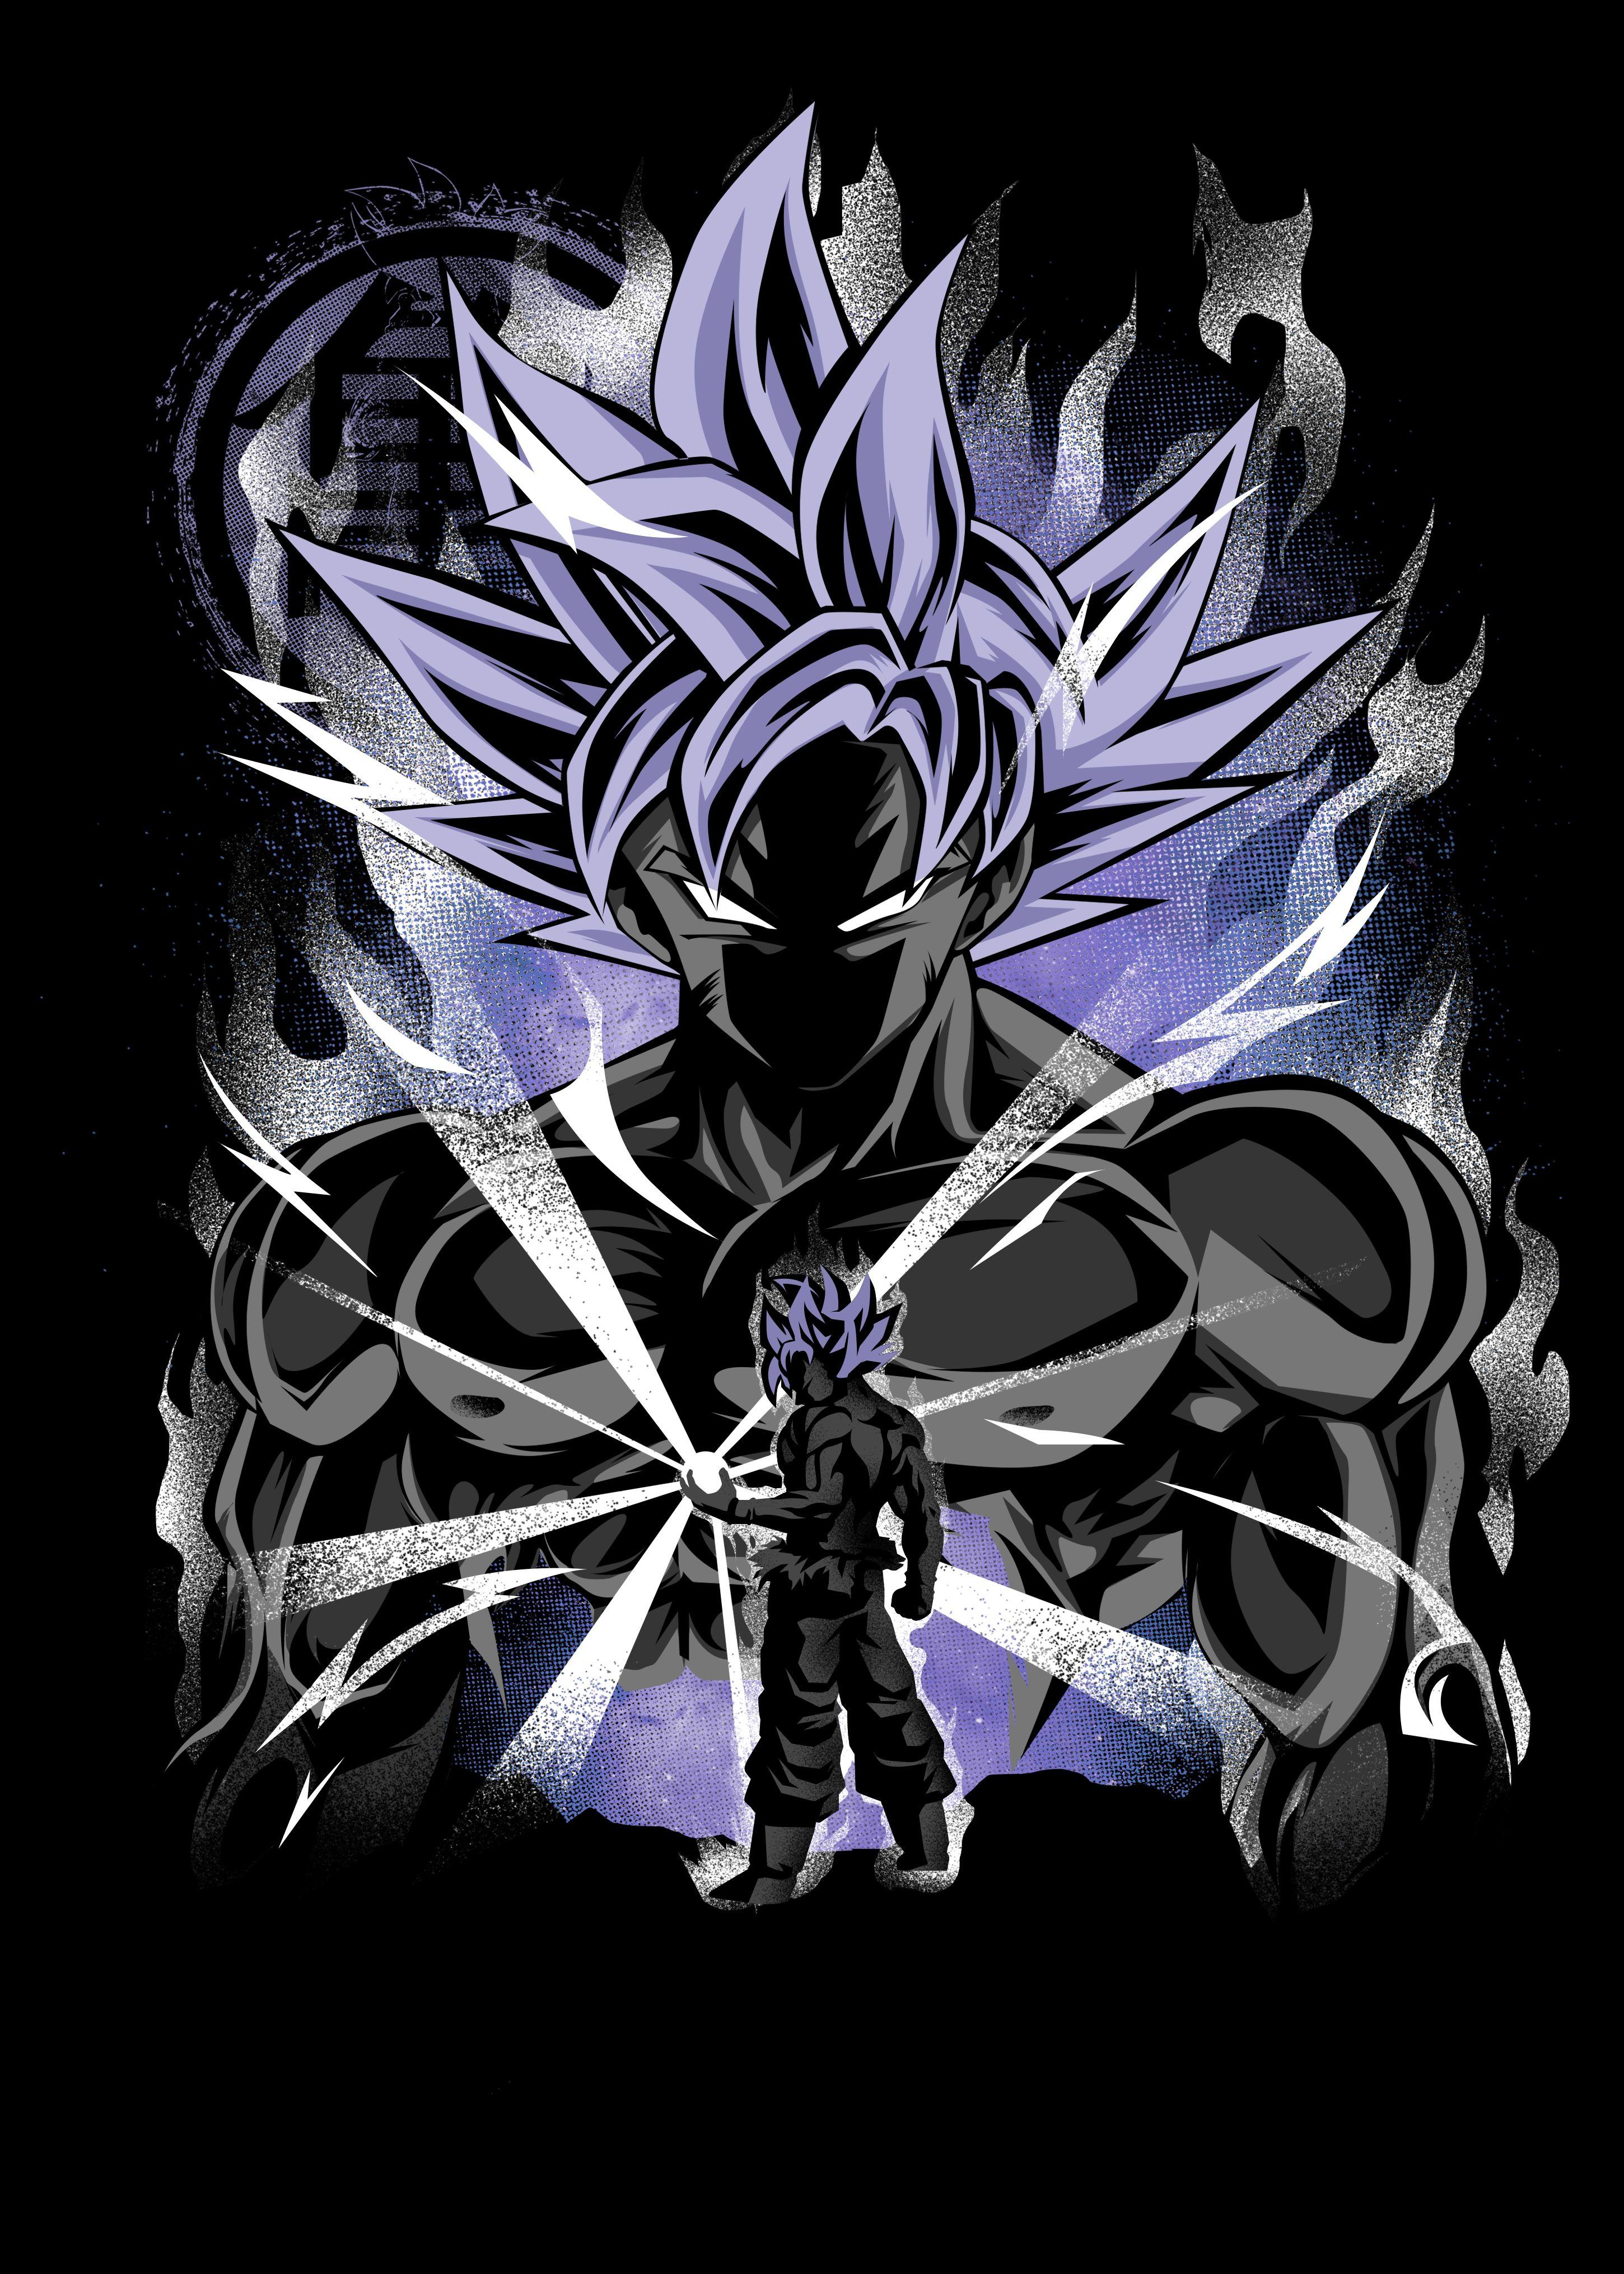 Ultra Instinct Hero Dragon Ball Super Artwork Anime Dragon Ball Super Dragon Ball Super Goku